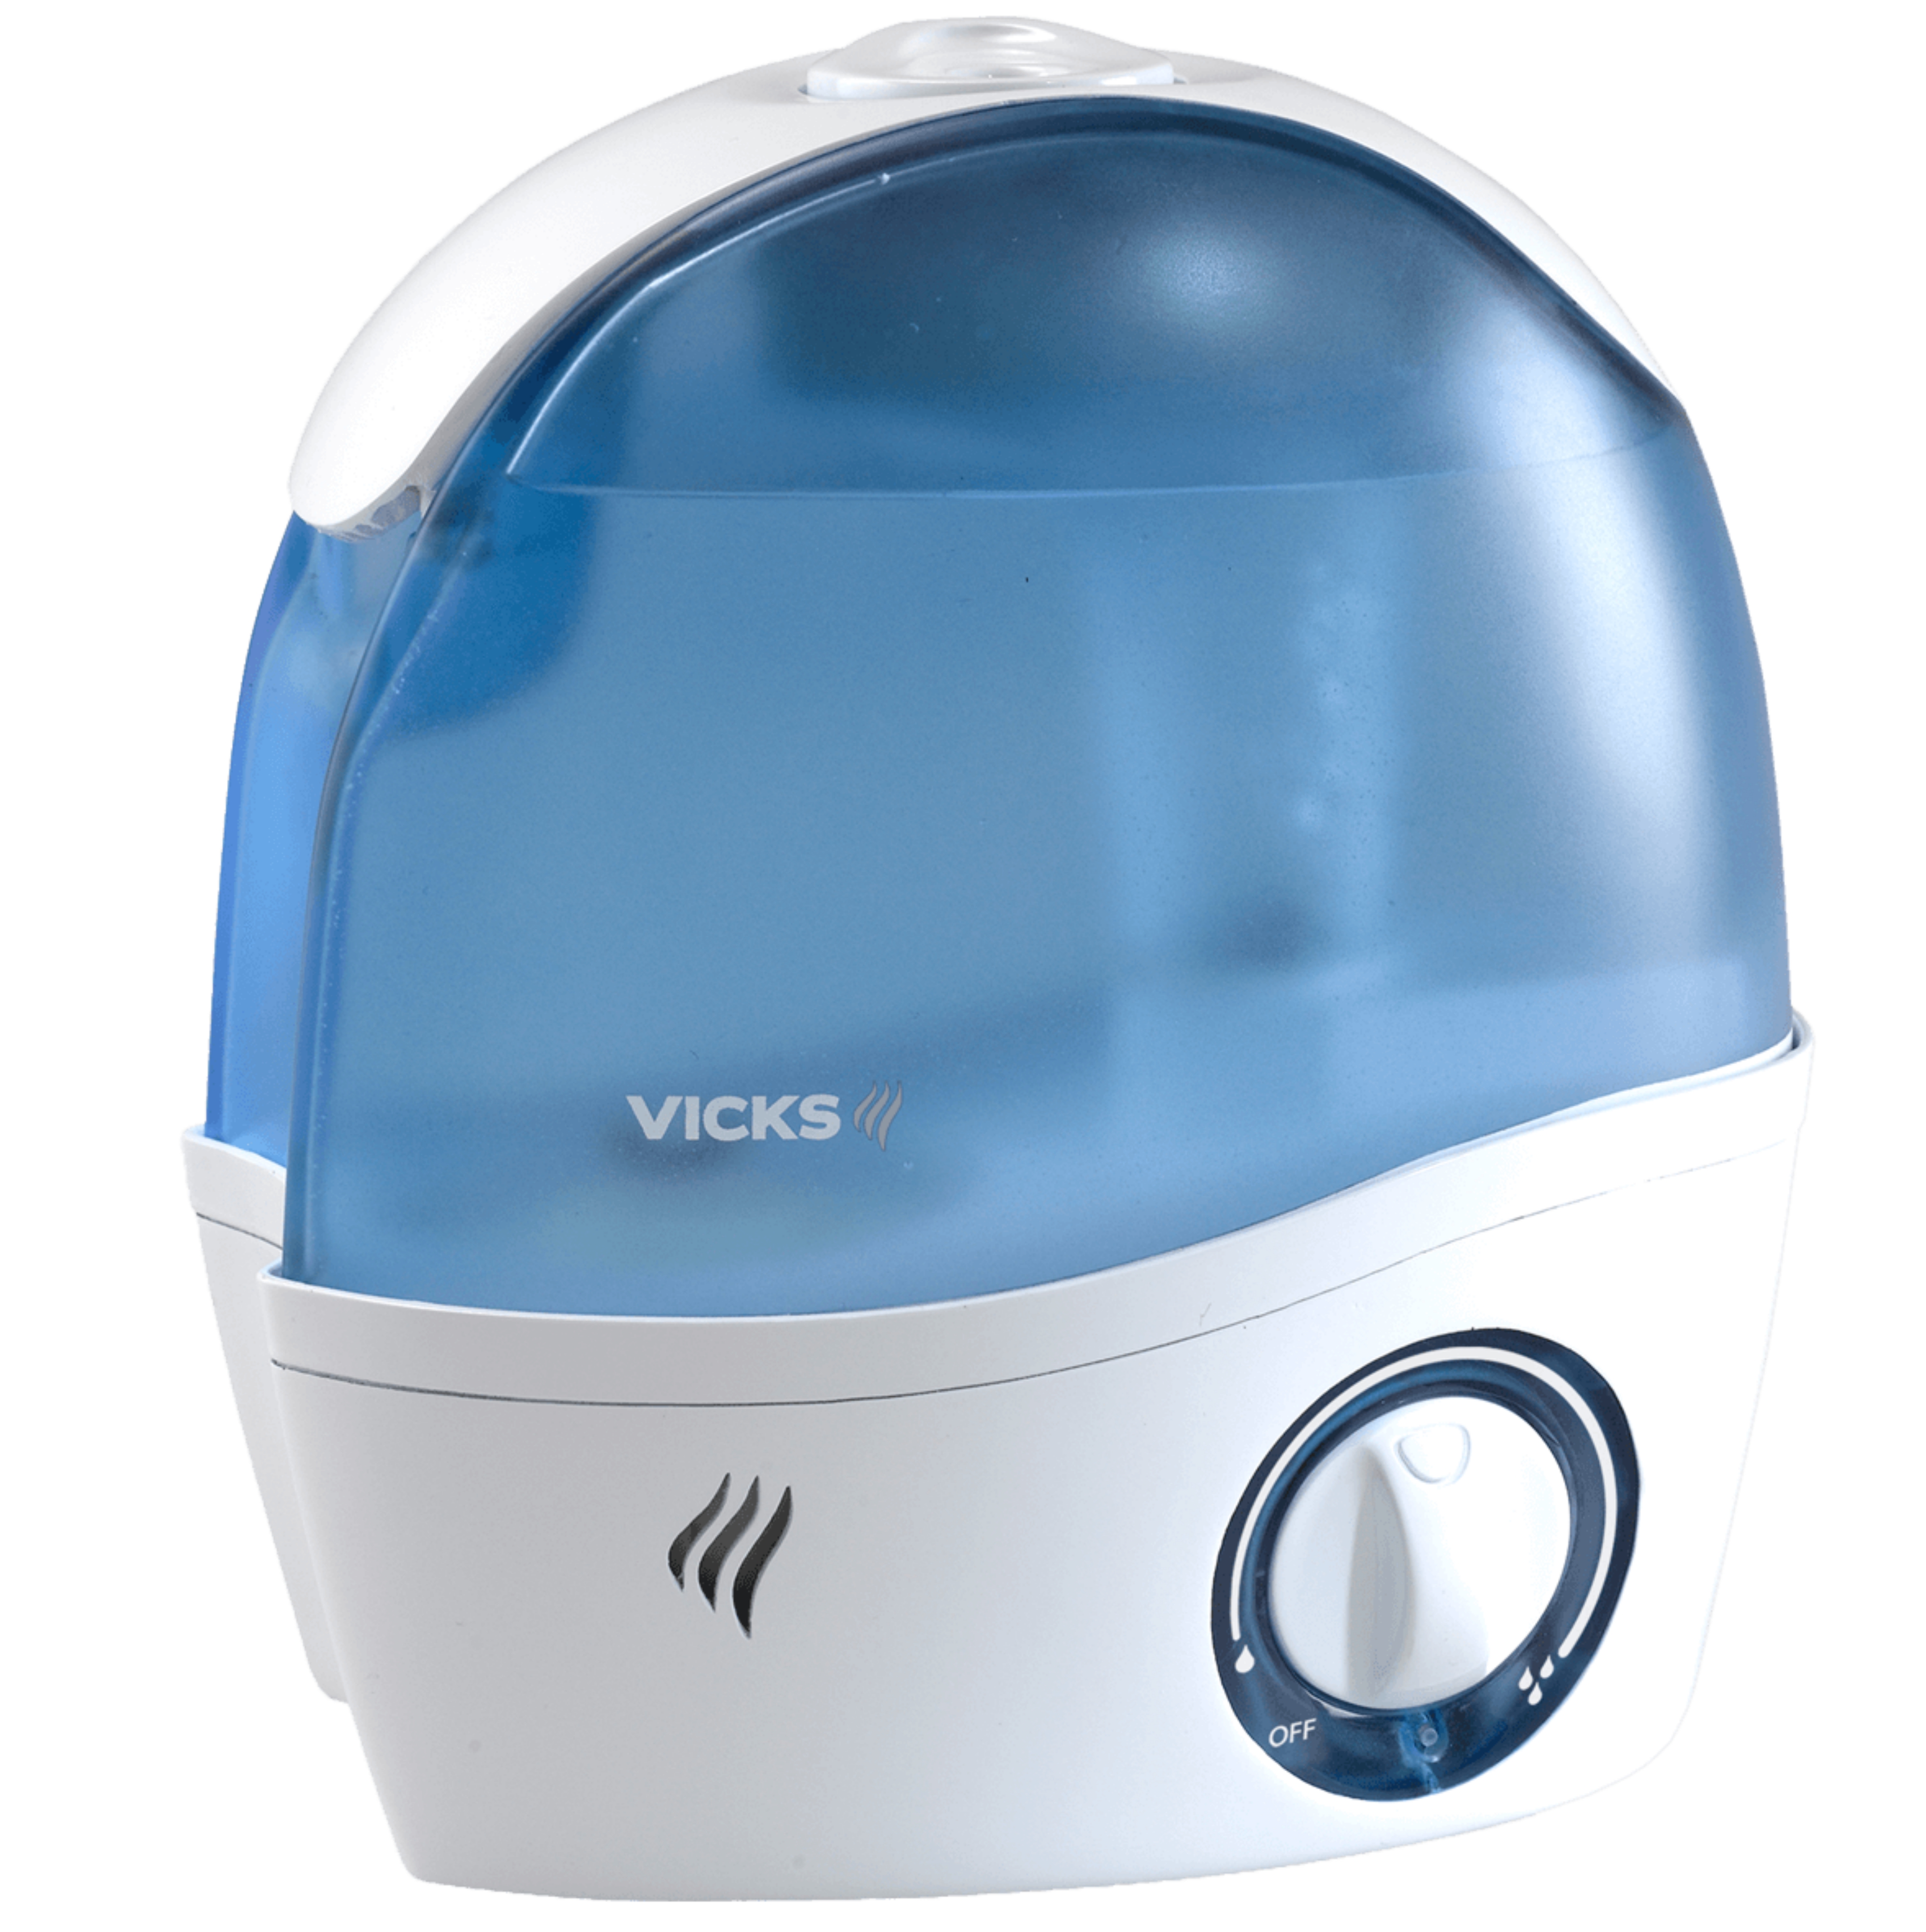 Vicks CH5000 Demineralization Cartridge|Ultrasonic Humidifier|Antibacterica|New